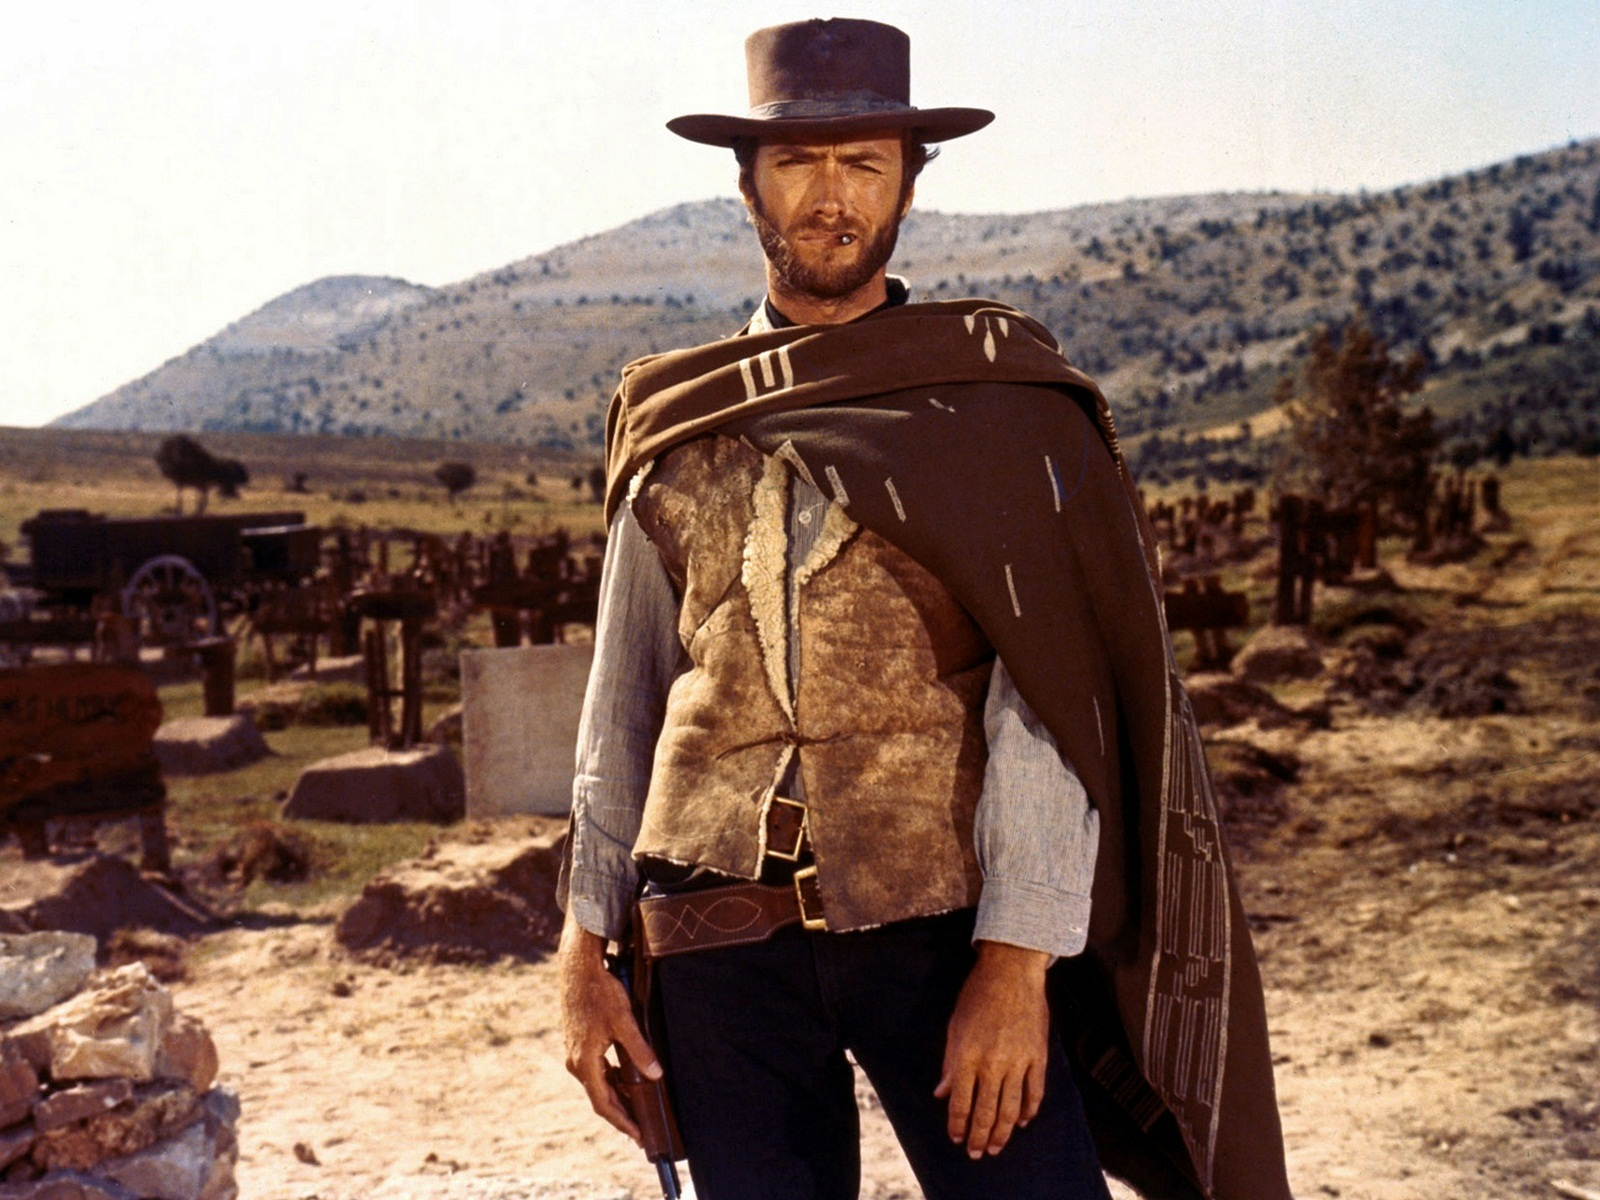 Célébrités - Clint Eastwood  Fond d'écran